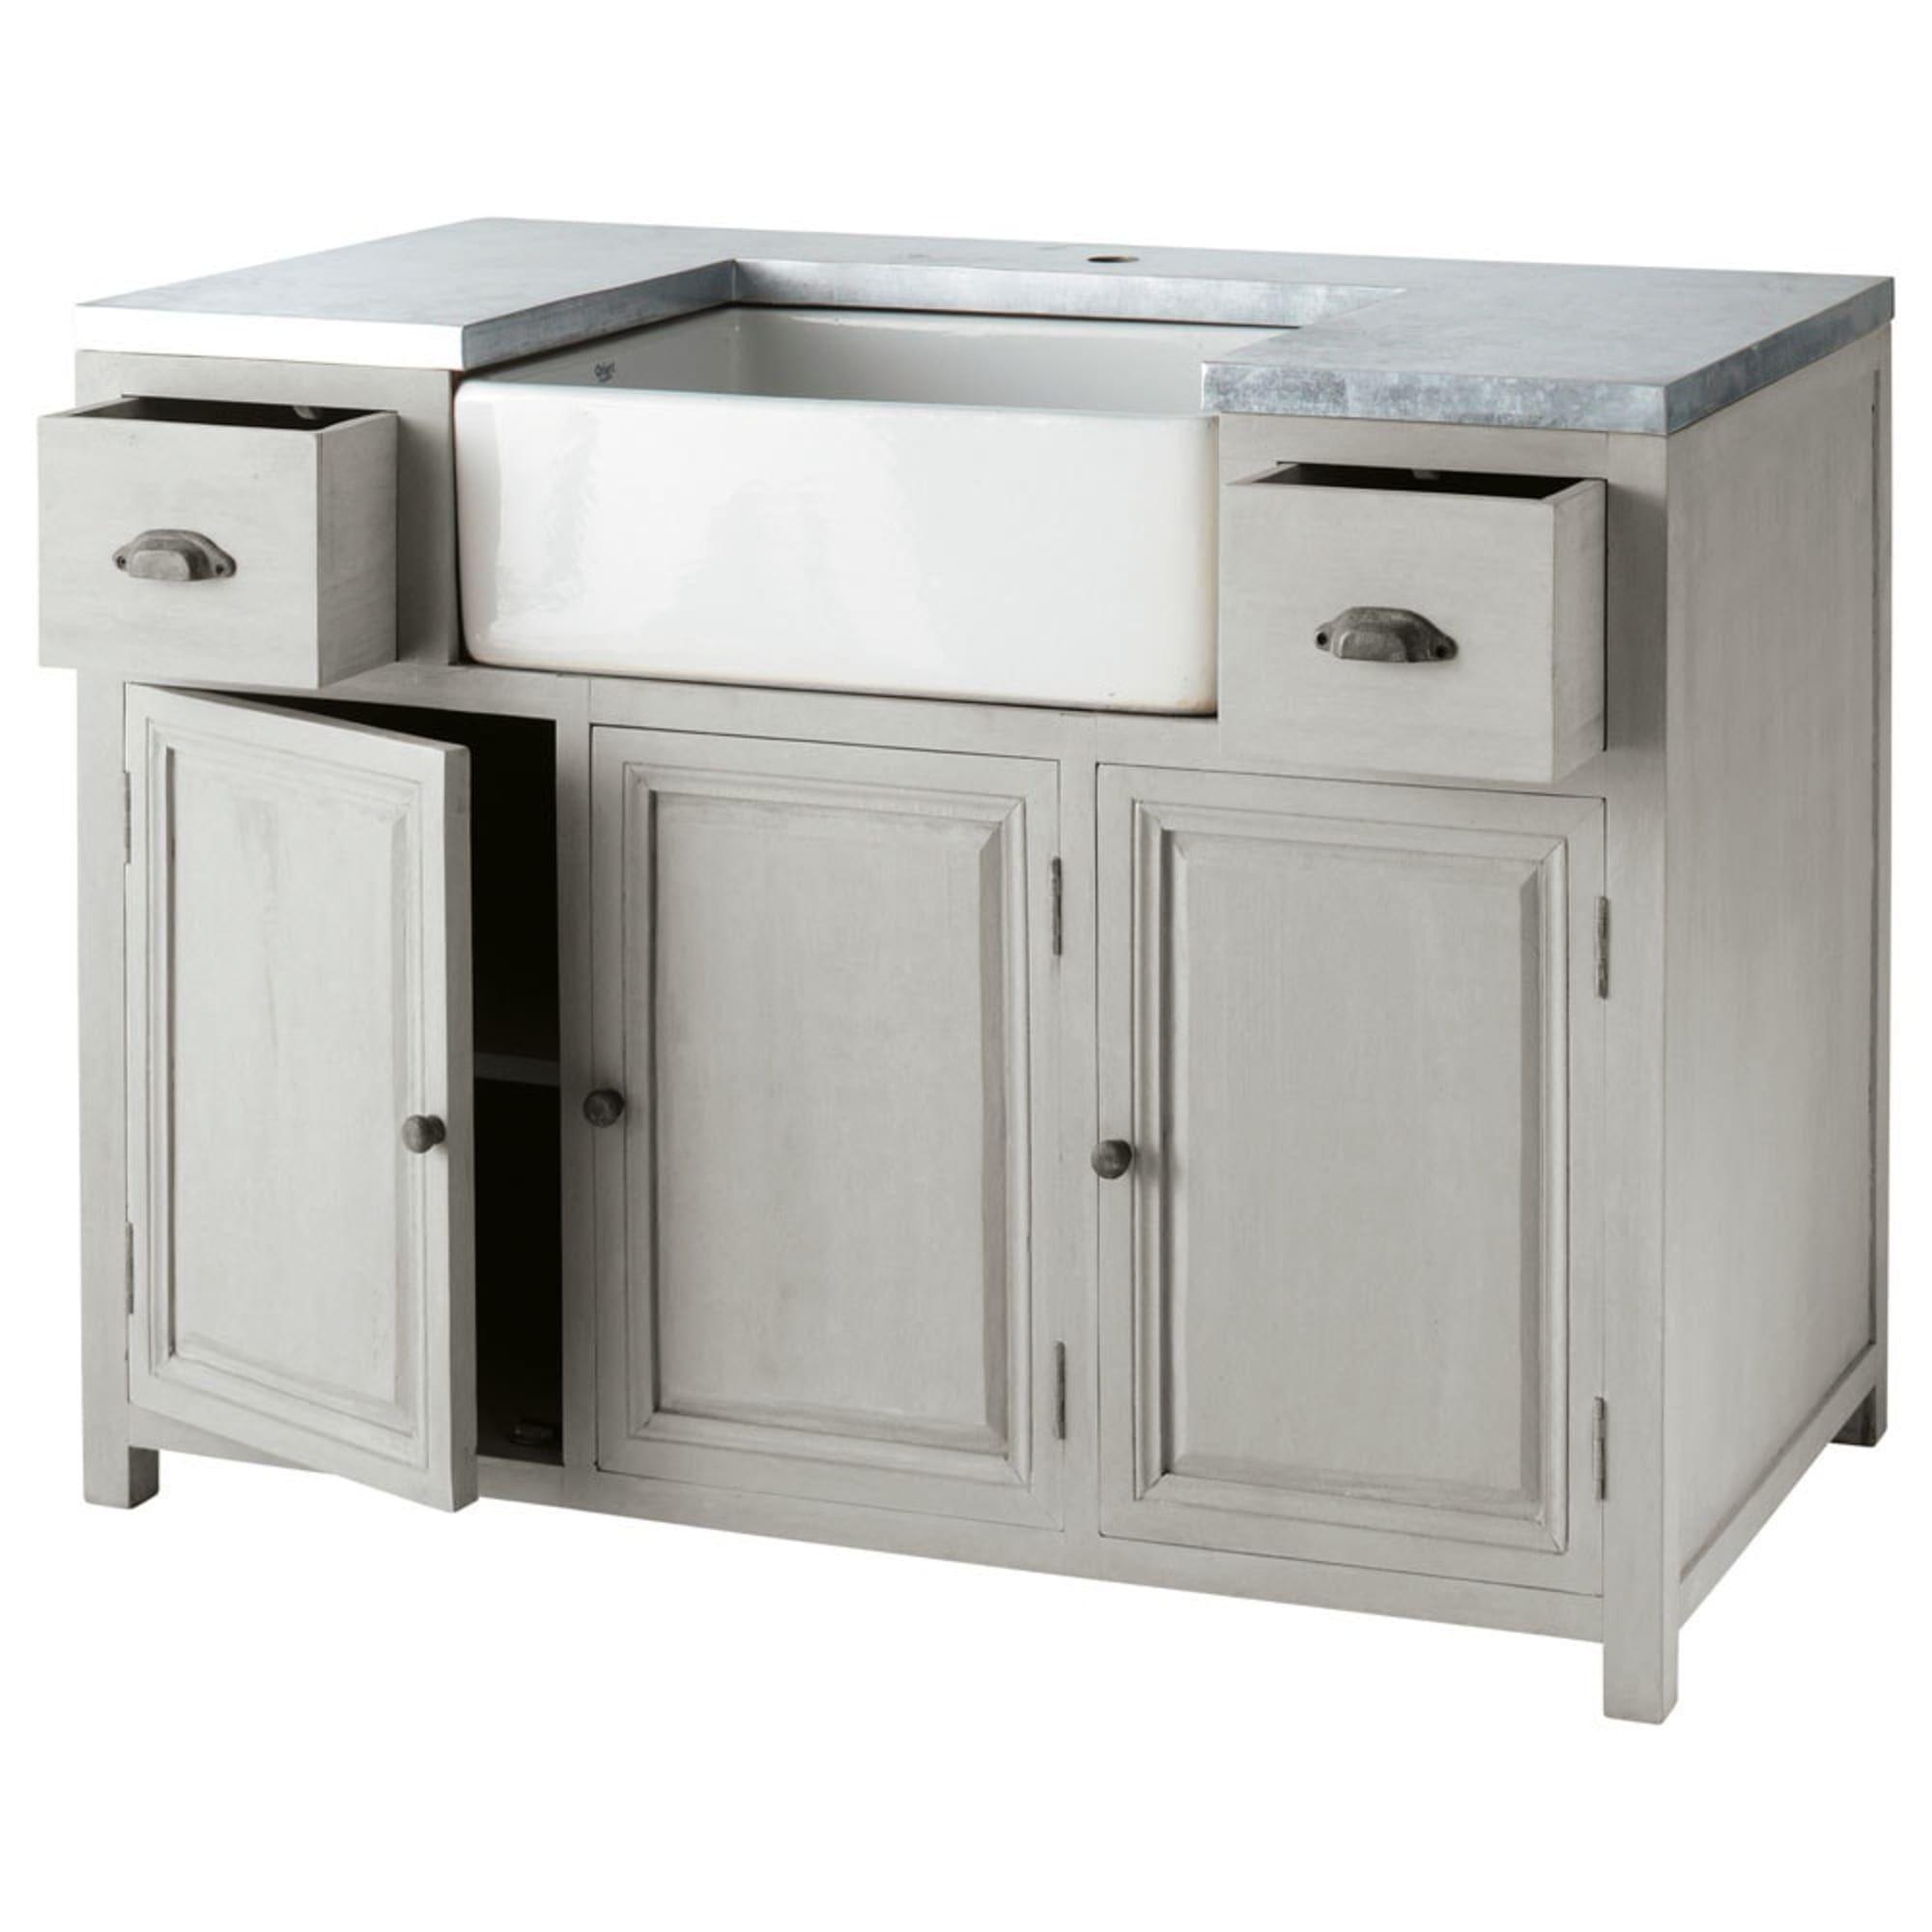 Mobile Basso Da Cucina Grigio In Acacia Con Lavello L 120 Cm Zinc Maisons Du Monde Kitchen Sink Units Kitchen Furniture Storage Kitchen Cabinets With Sink